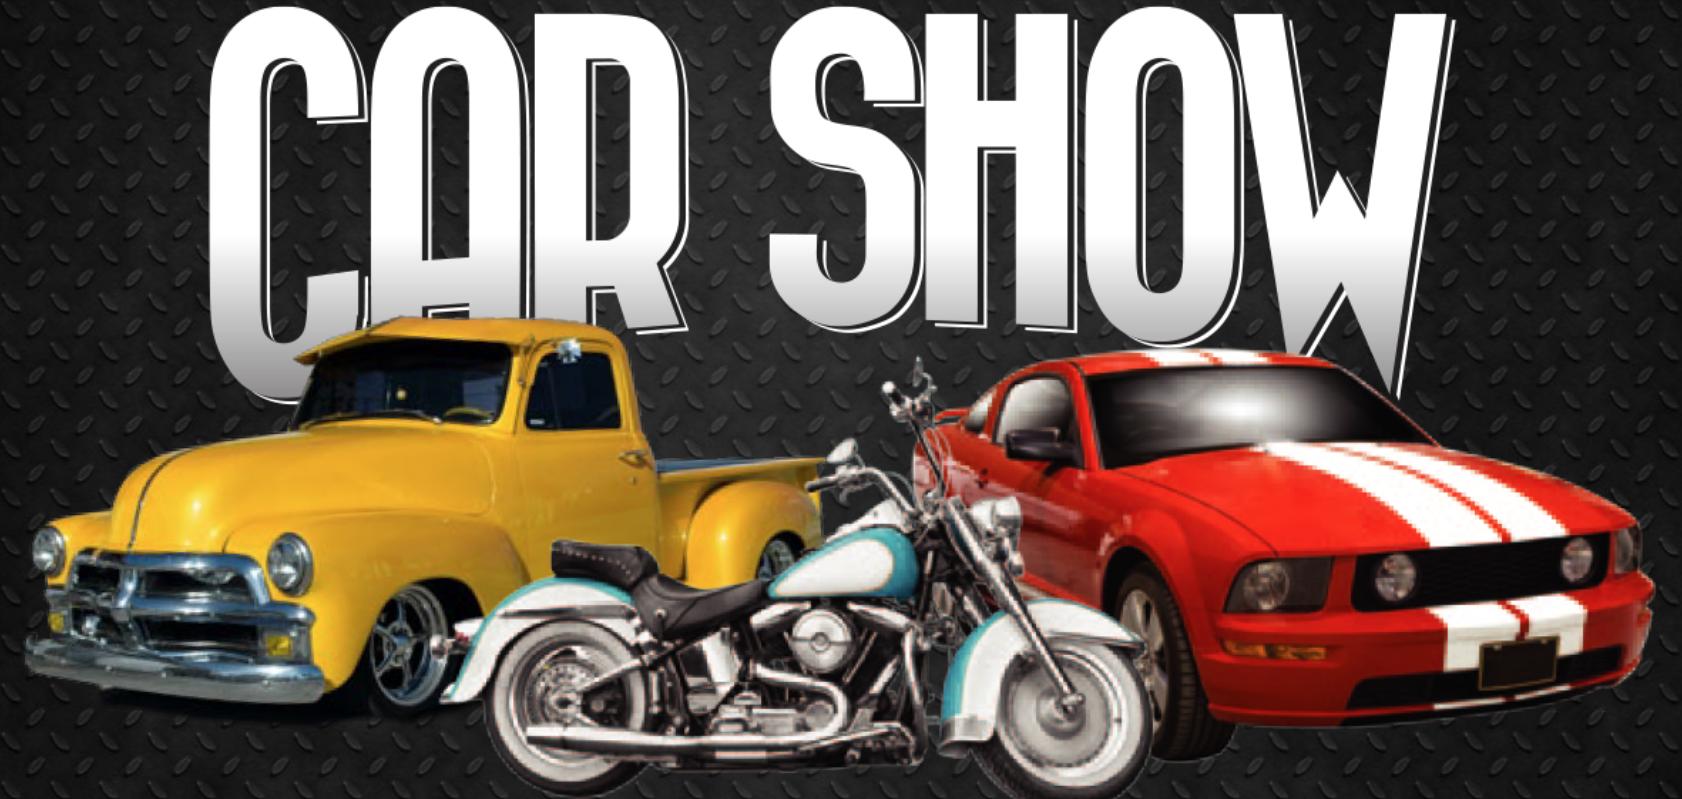 car-truck-show-1.png